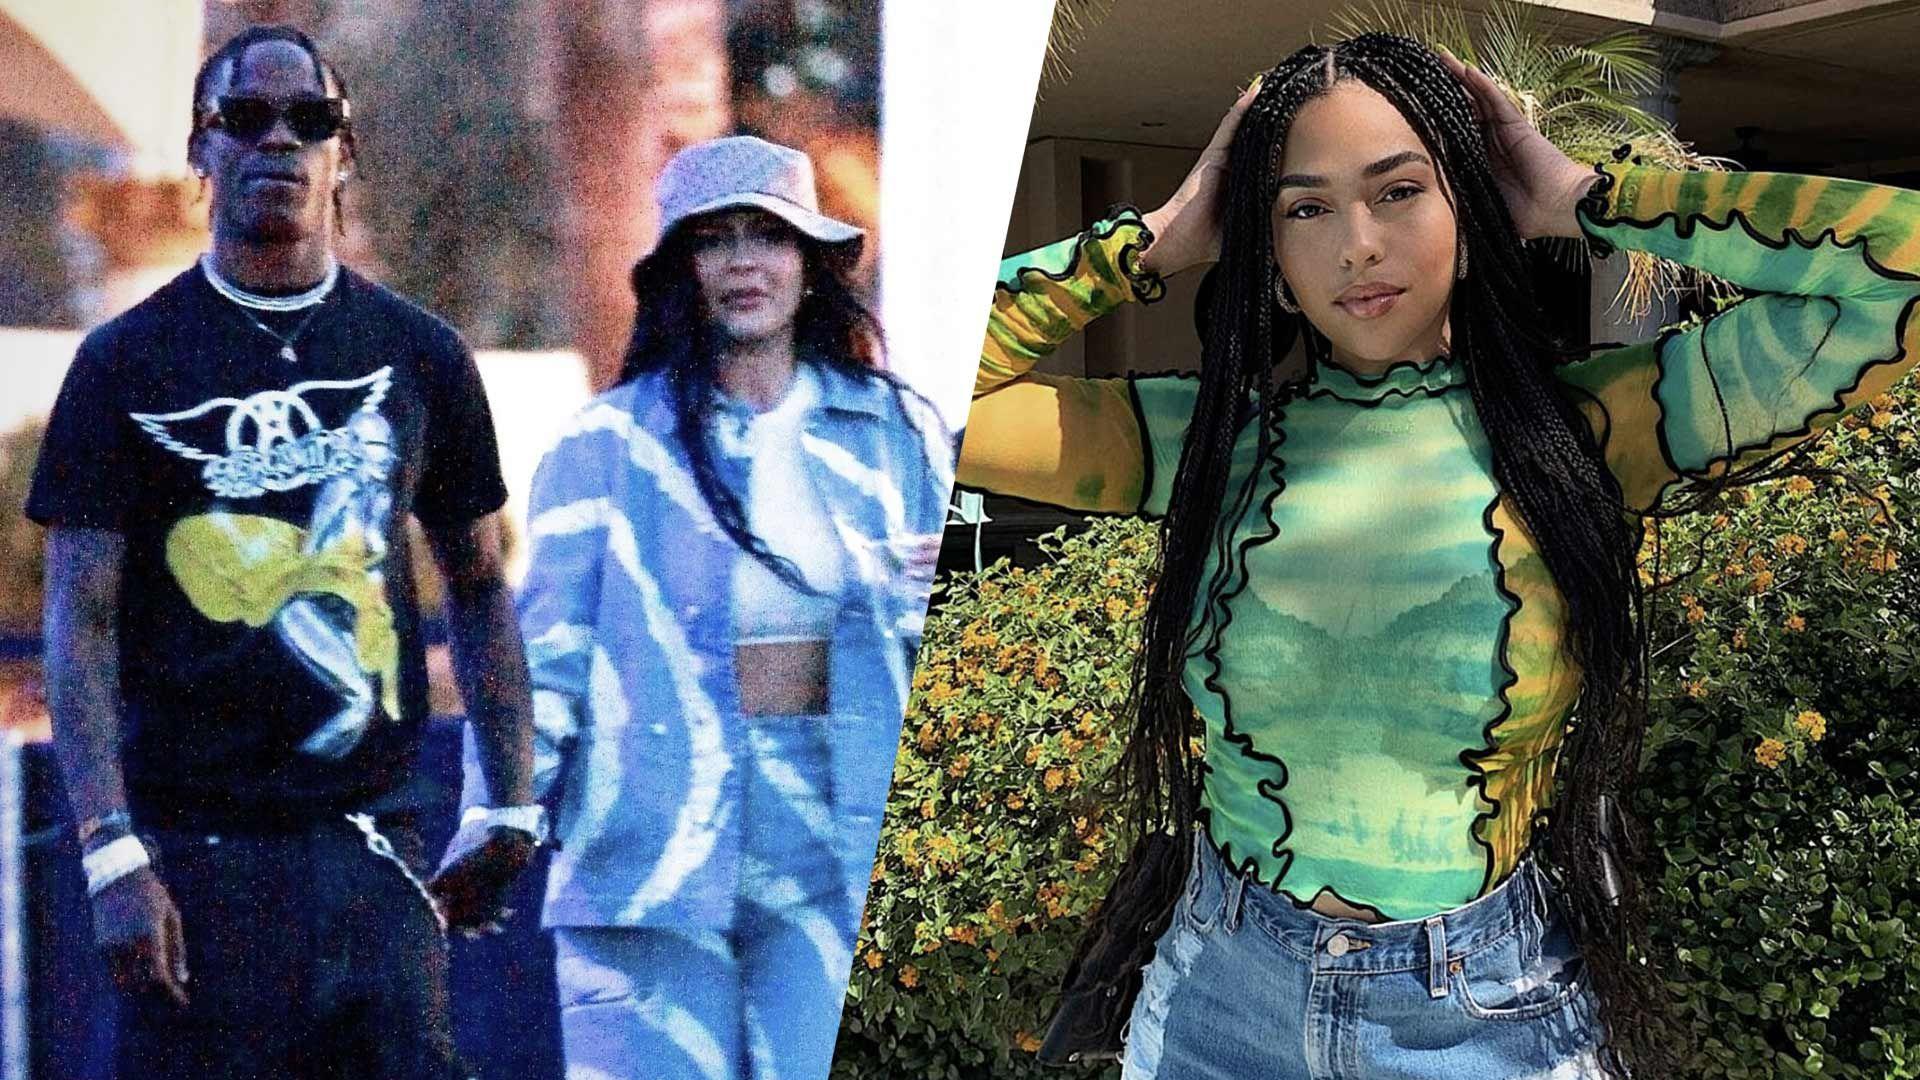 Kylie Jenner & Jordyn Woods Were Both at Coachella